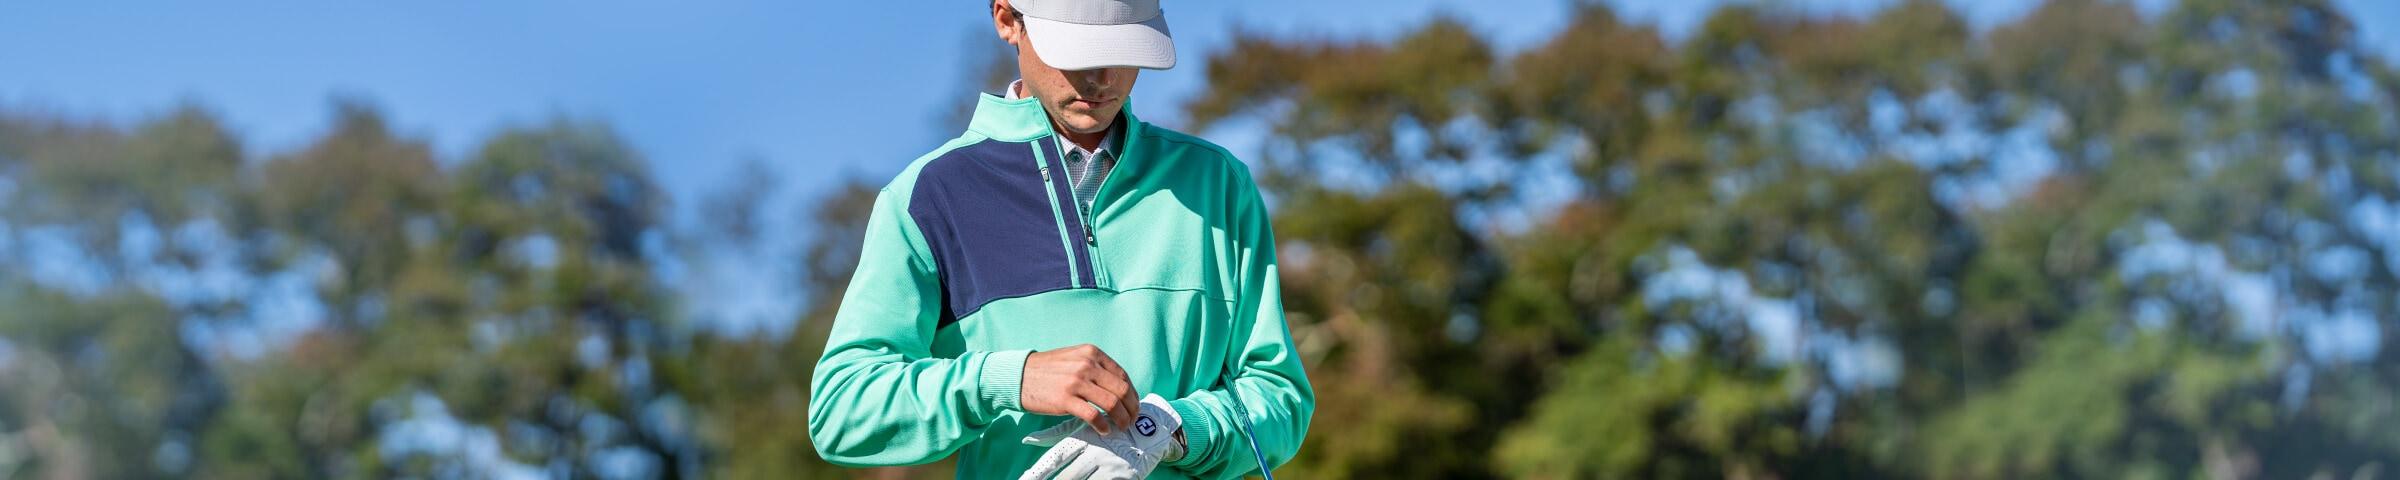 FootJoy Men's Golf Apparel - Base & Mid-Layers